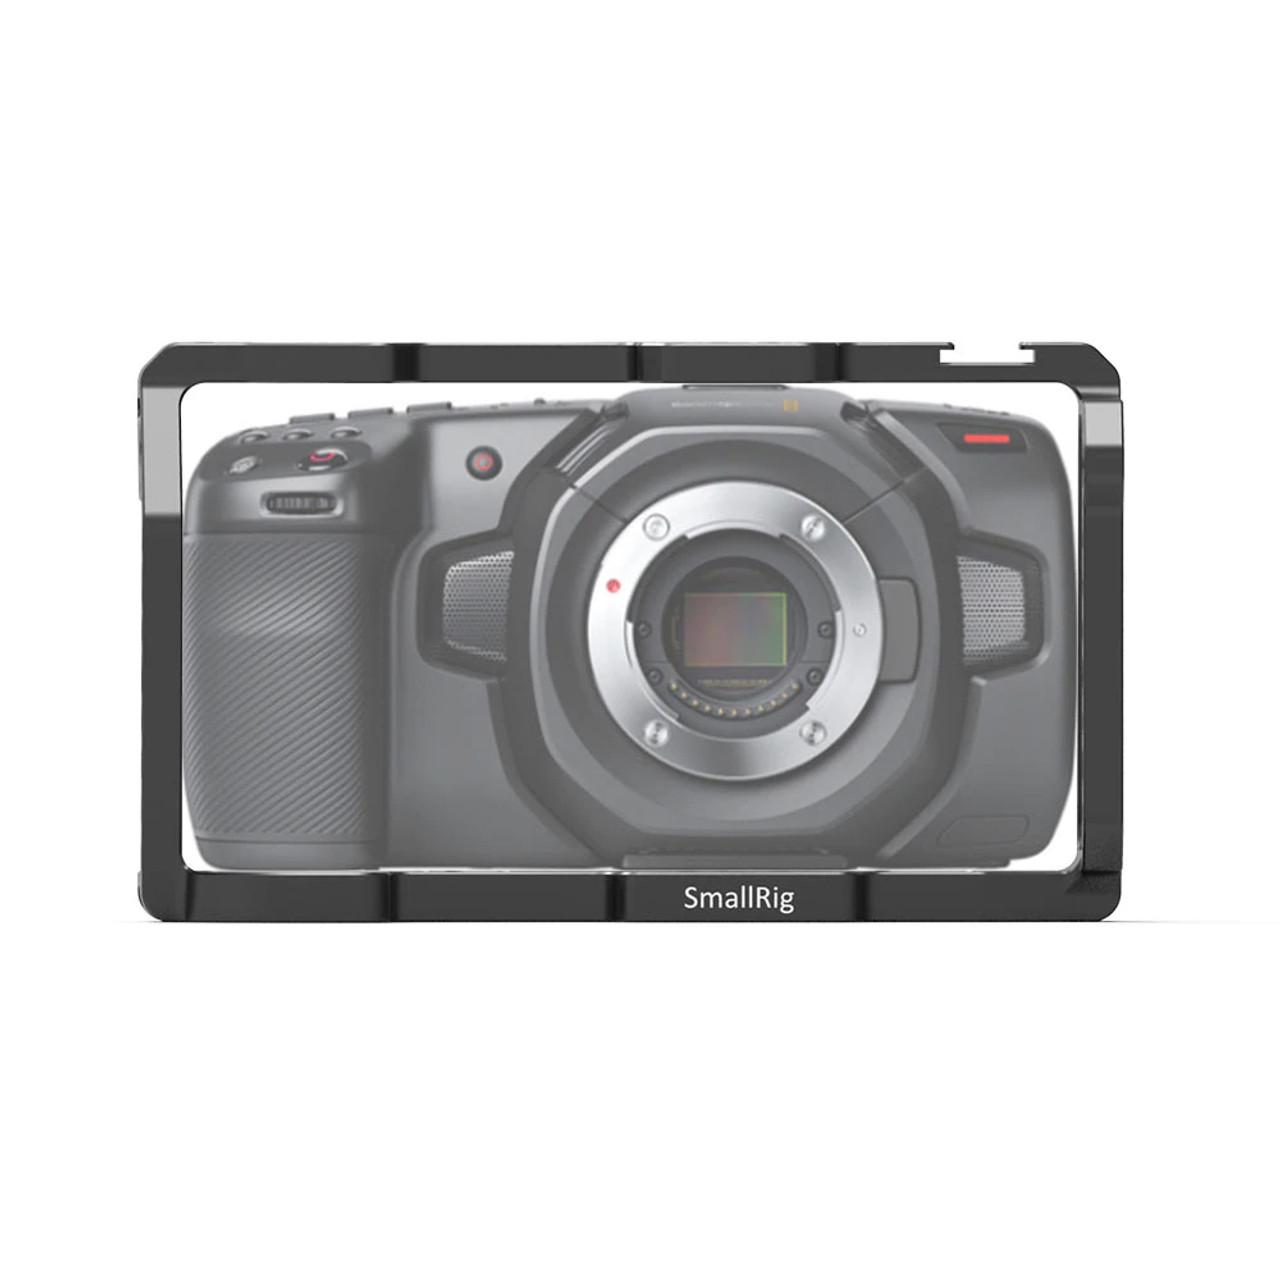 Smallrig Cage For Blackmagic Design Pocket Cinema Camera 4k 6k 2203 Auckland Nz